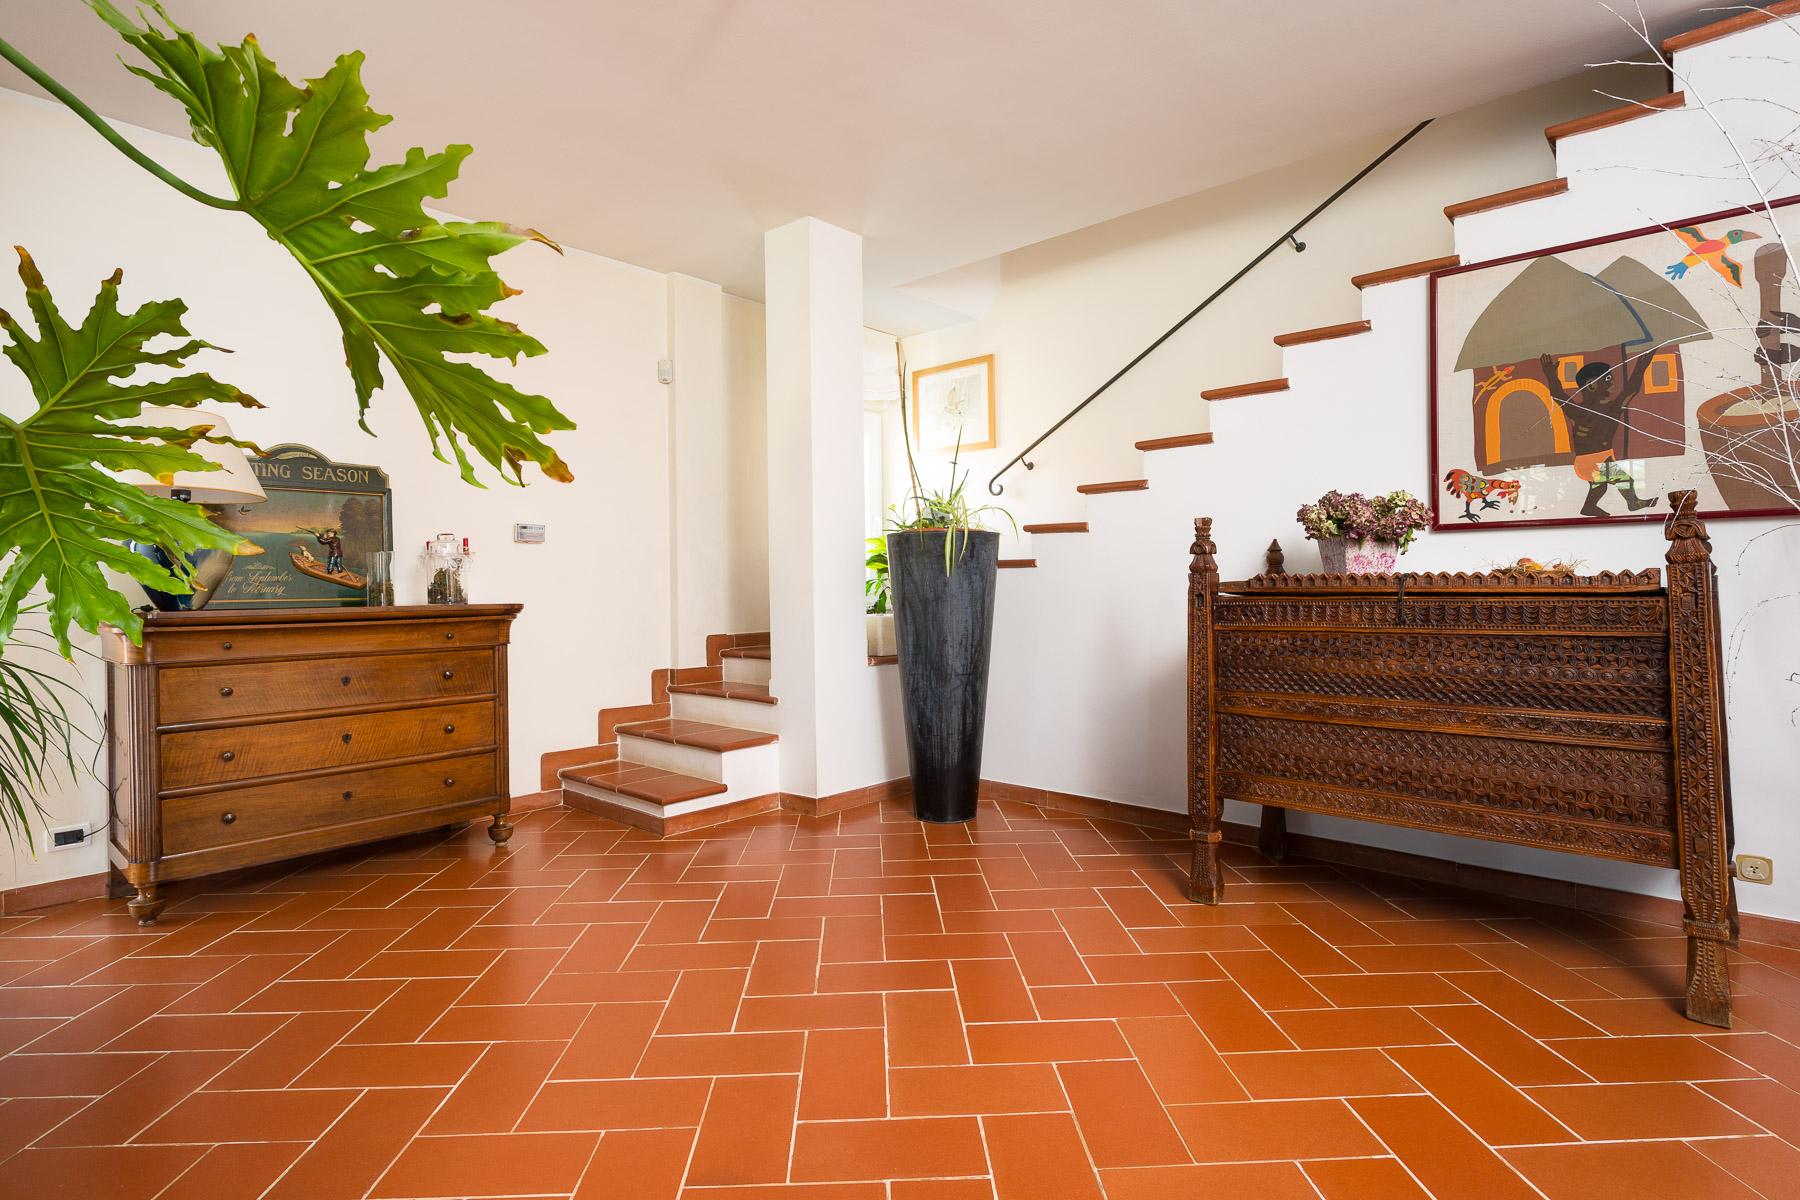 Villa in Vendita a Pino Torinese: 5 locali, 350 mq - Foto 7